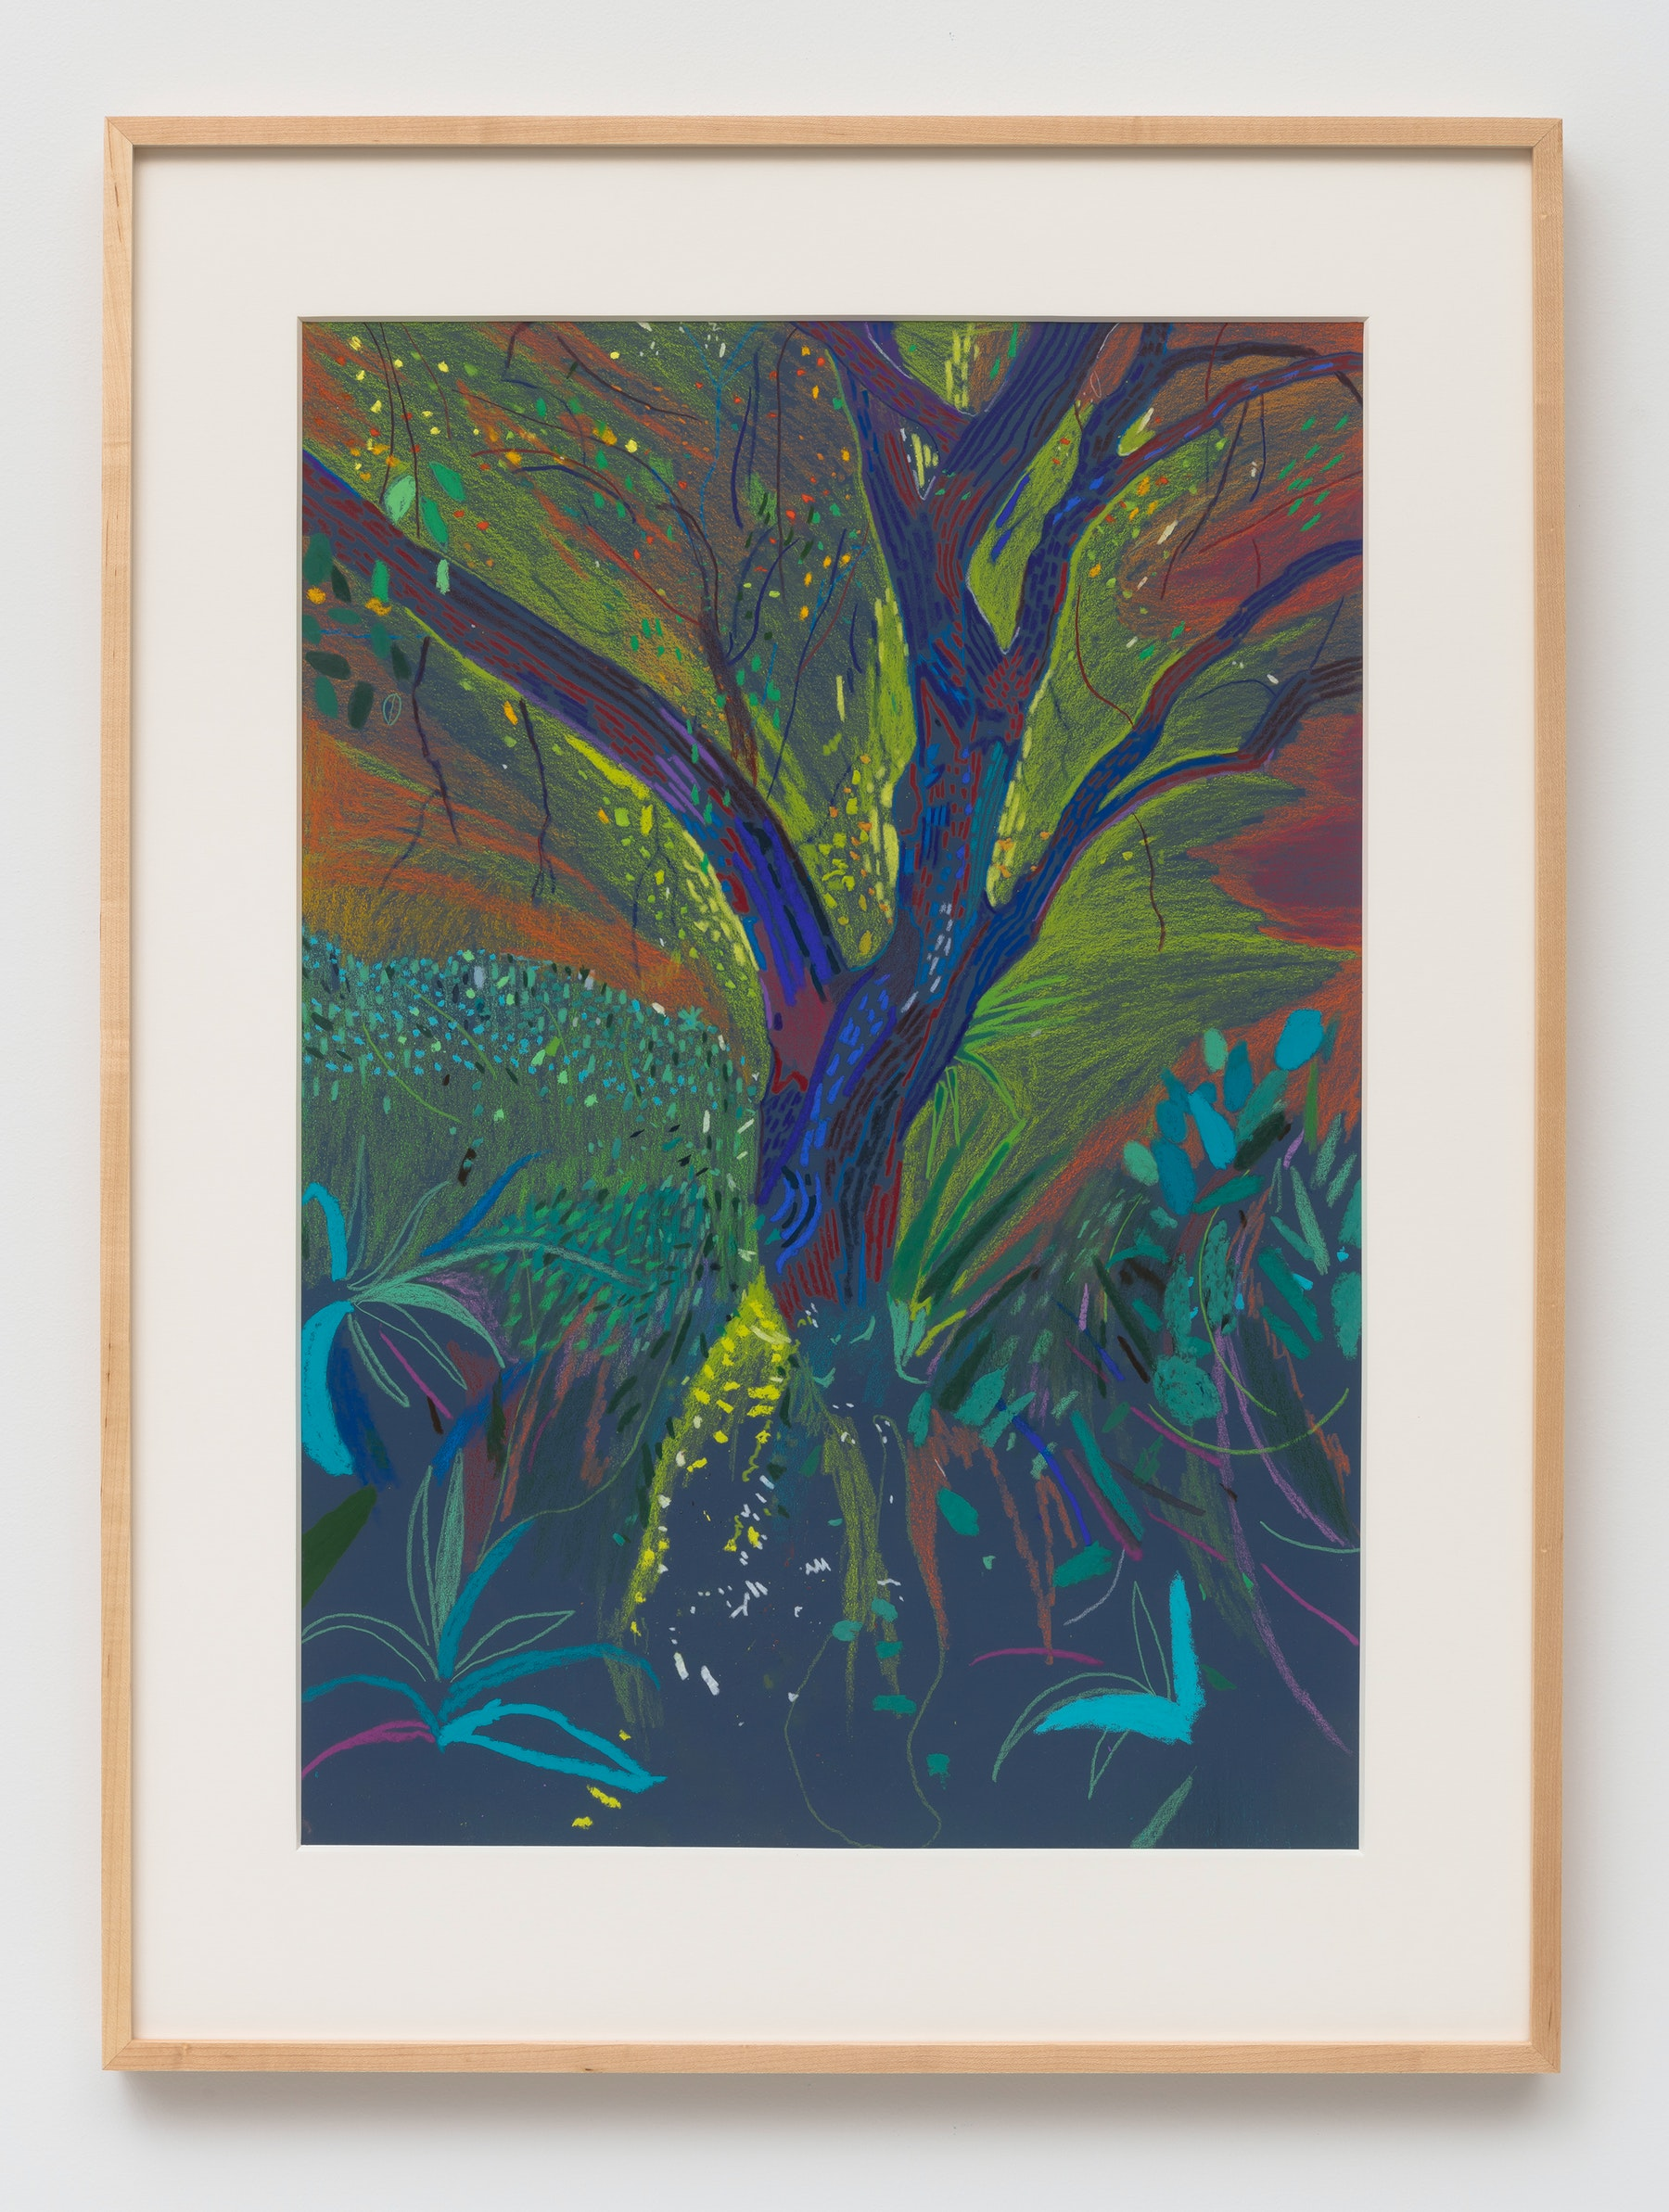 "Raffi Kalenderian ""Nick's Garden,"" 2020 Pastel and acrylic on paper 28 x 20"" [HxW] (71.12 x 50.8 cm); 33.5 x 25 x 1.5"" [HxWxD] (85.09 x 63.5 x 3.81 cm)framed Inventory #KAL278 Courtesy of the artist and Vielmetter Los Angeles Photo credit: Robert Wedemeyer"